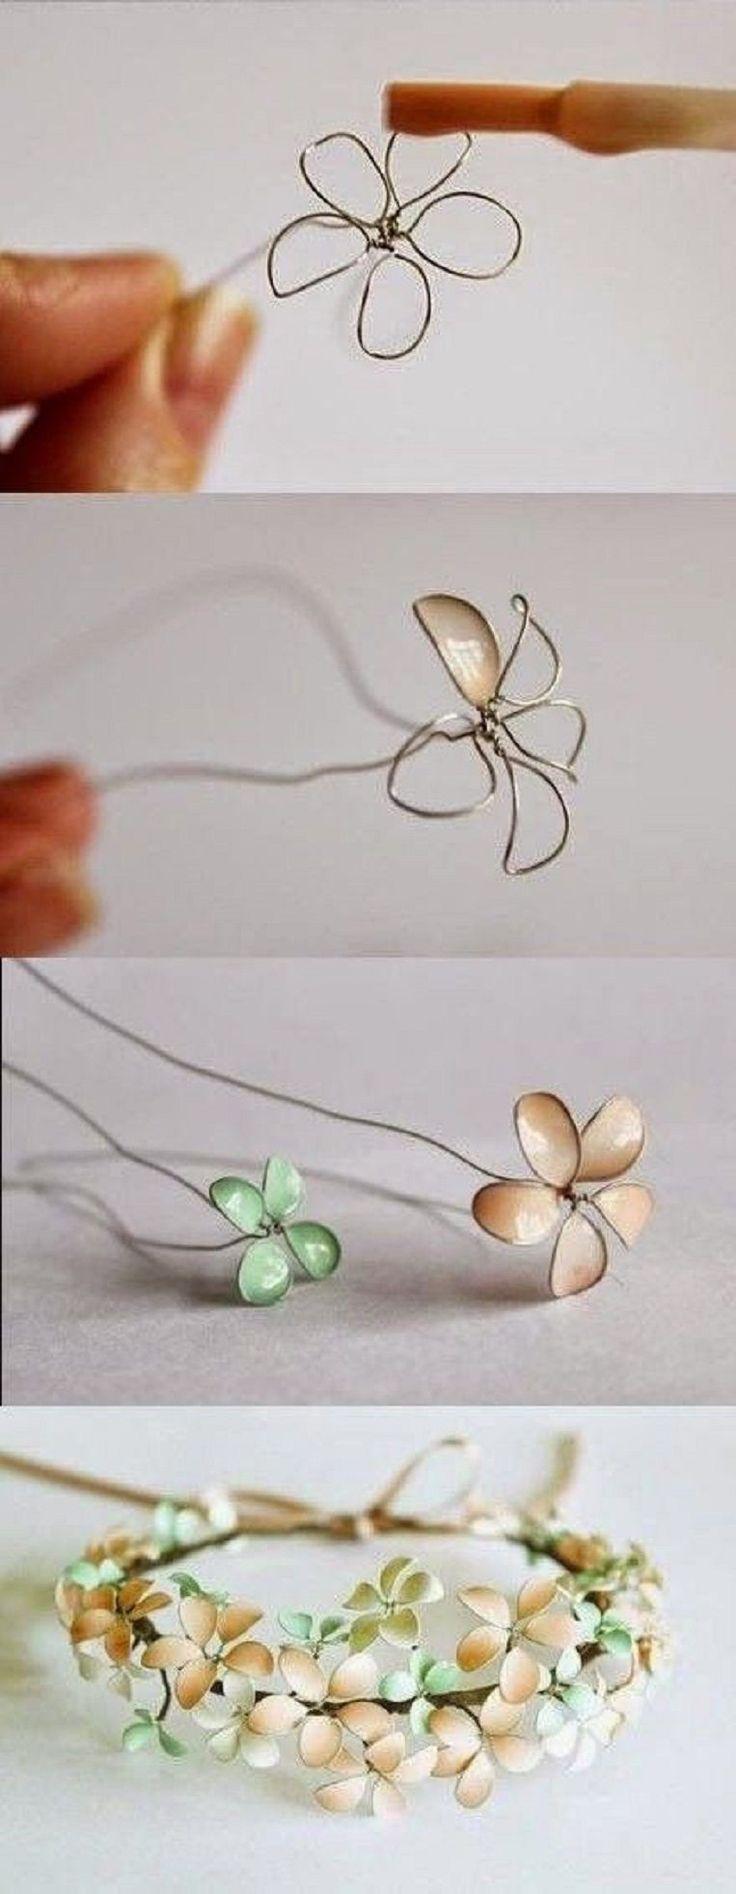 Best 20 diy flower crown ideas on pinterest flower crowns diy stained glass flower ring dhlflorist Choice Image